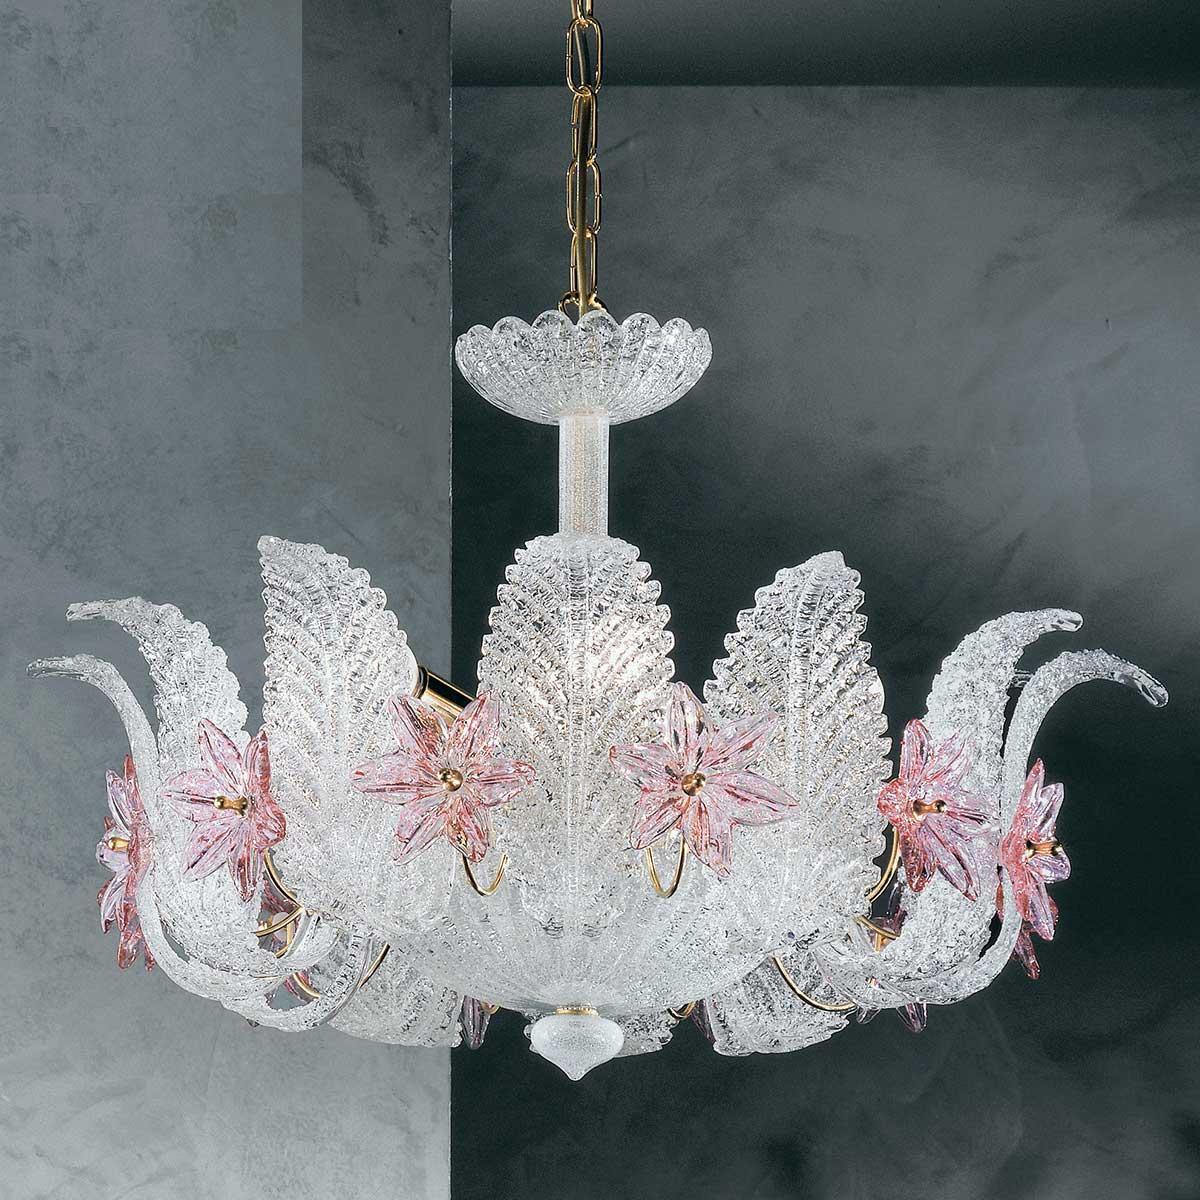 """Fiordaliso"" Murano glas Kronleuchter - 4 flammig - transparent und rosa"